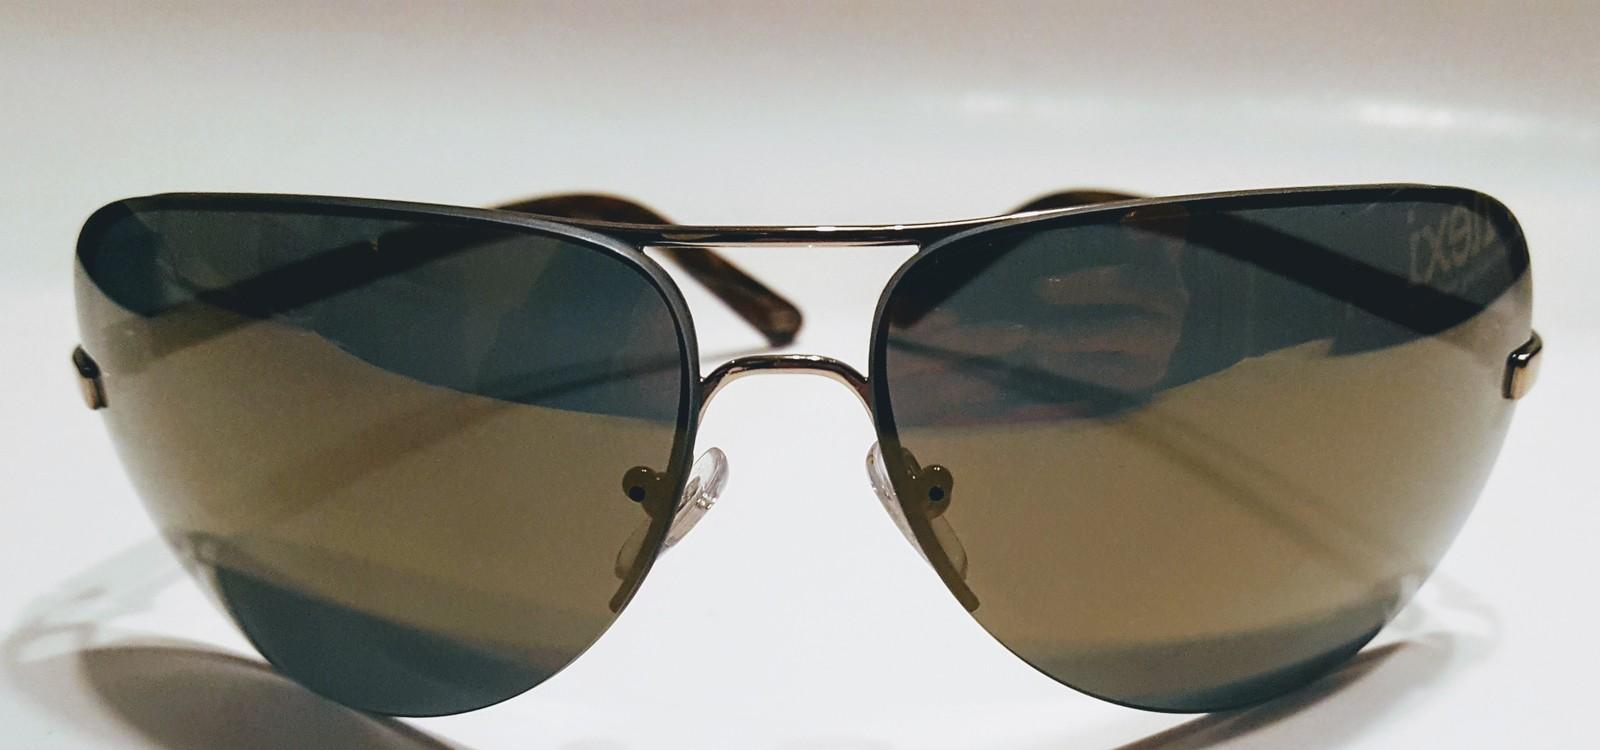 3ca4a45d35 Versace Sunglasses Mod. 2117 1283 4T and 50 similar items